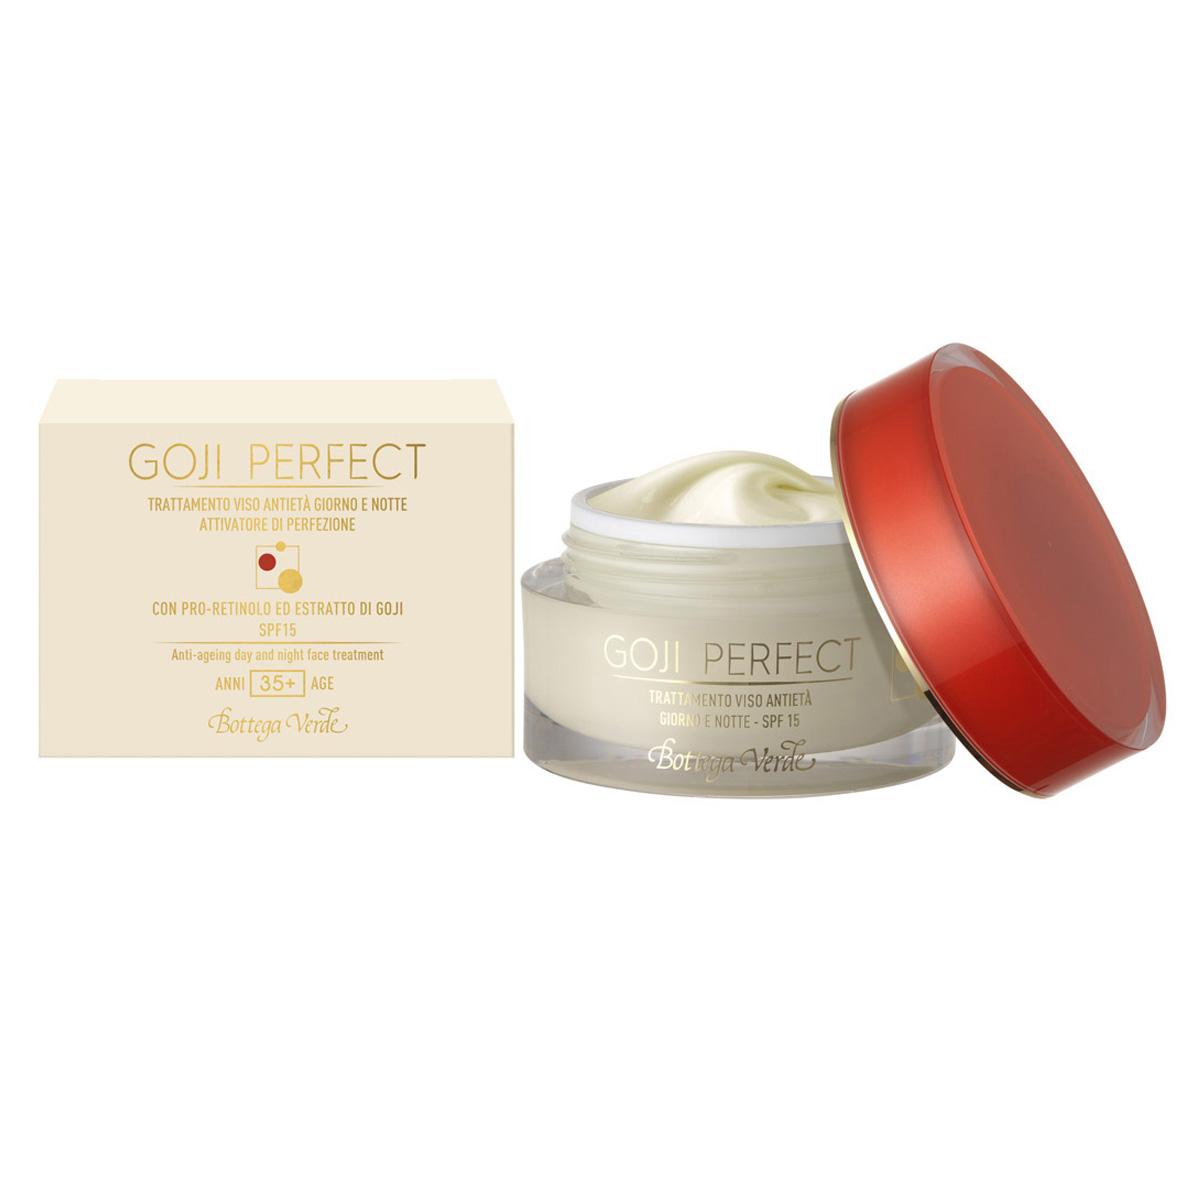 Goji Perfect - Tratament Pentru Fata Antirid  De Zi Si De Noapte Cu Pro-retinol Si Extract De Goji - Spf15 - Ani 35+